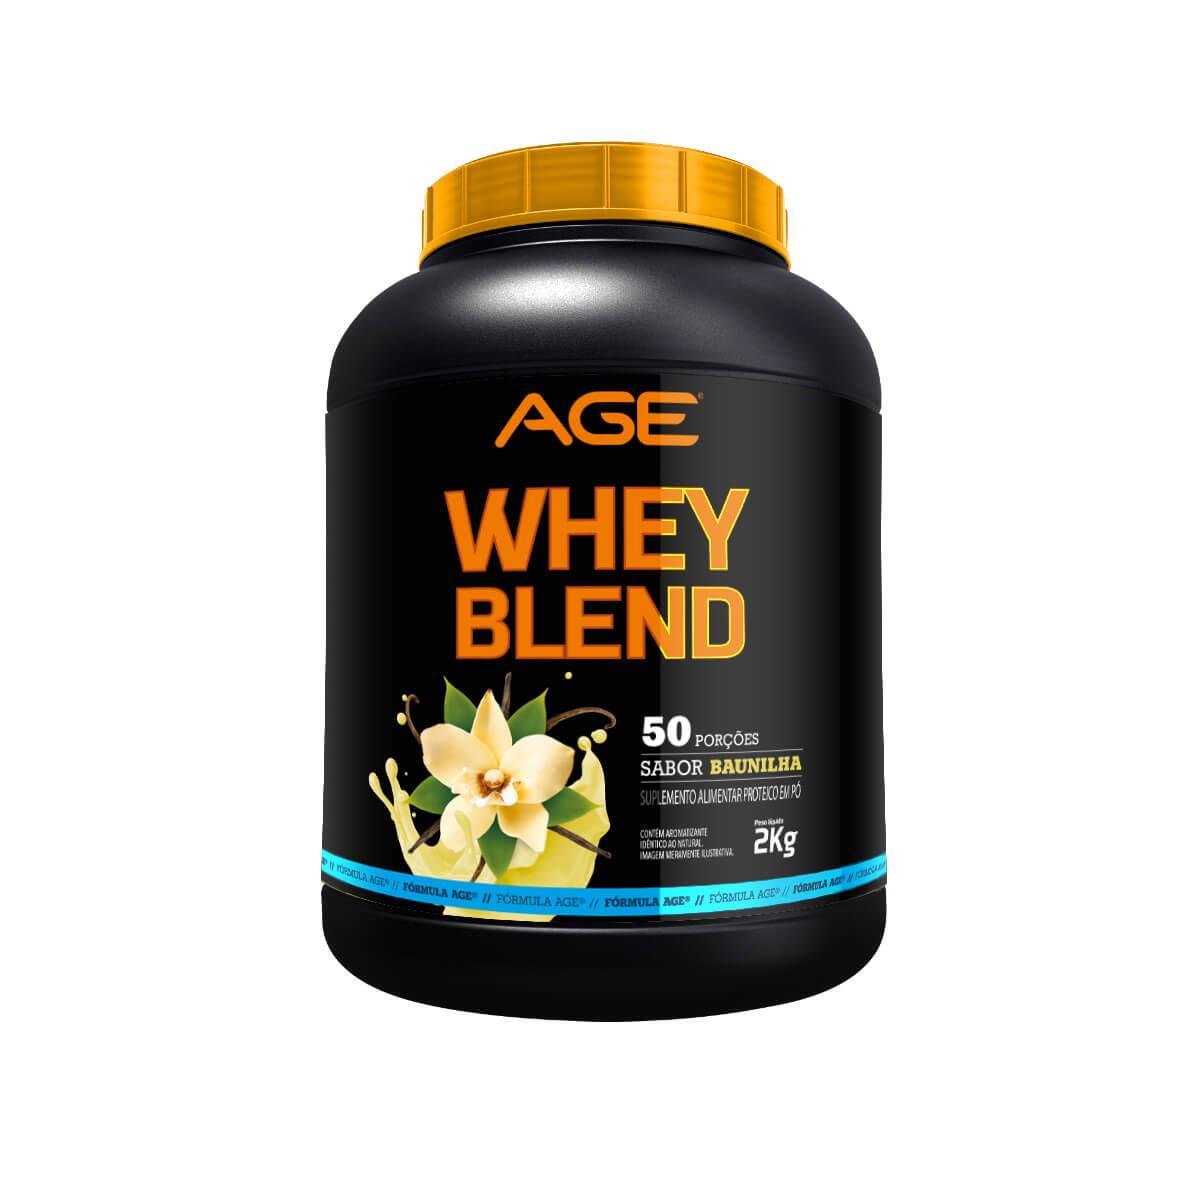 WHEY BLEND AGE (2Kg) - Baunilha - AGE